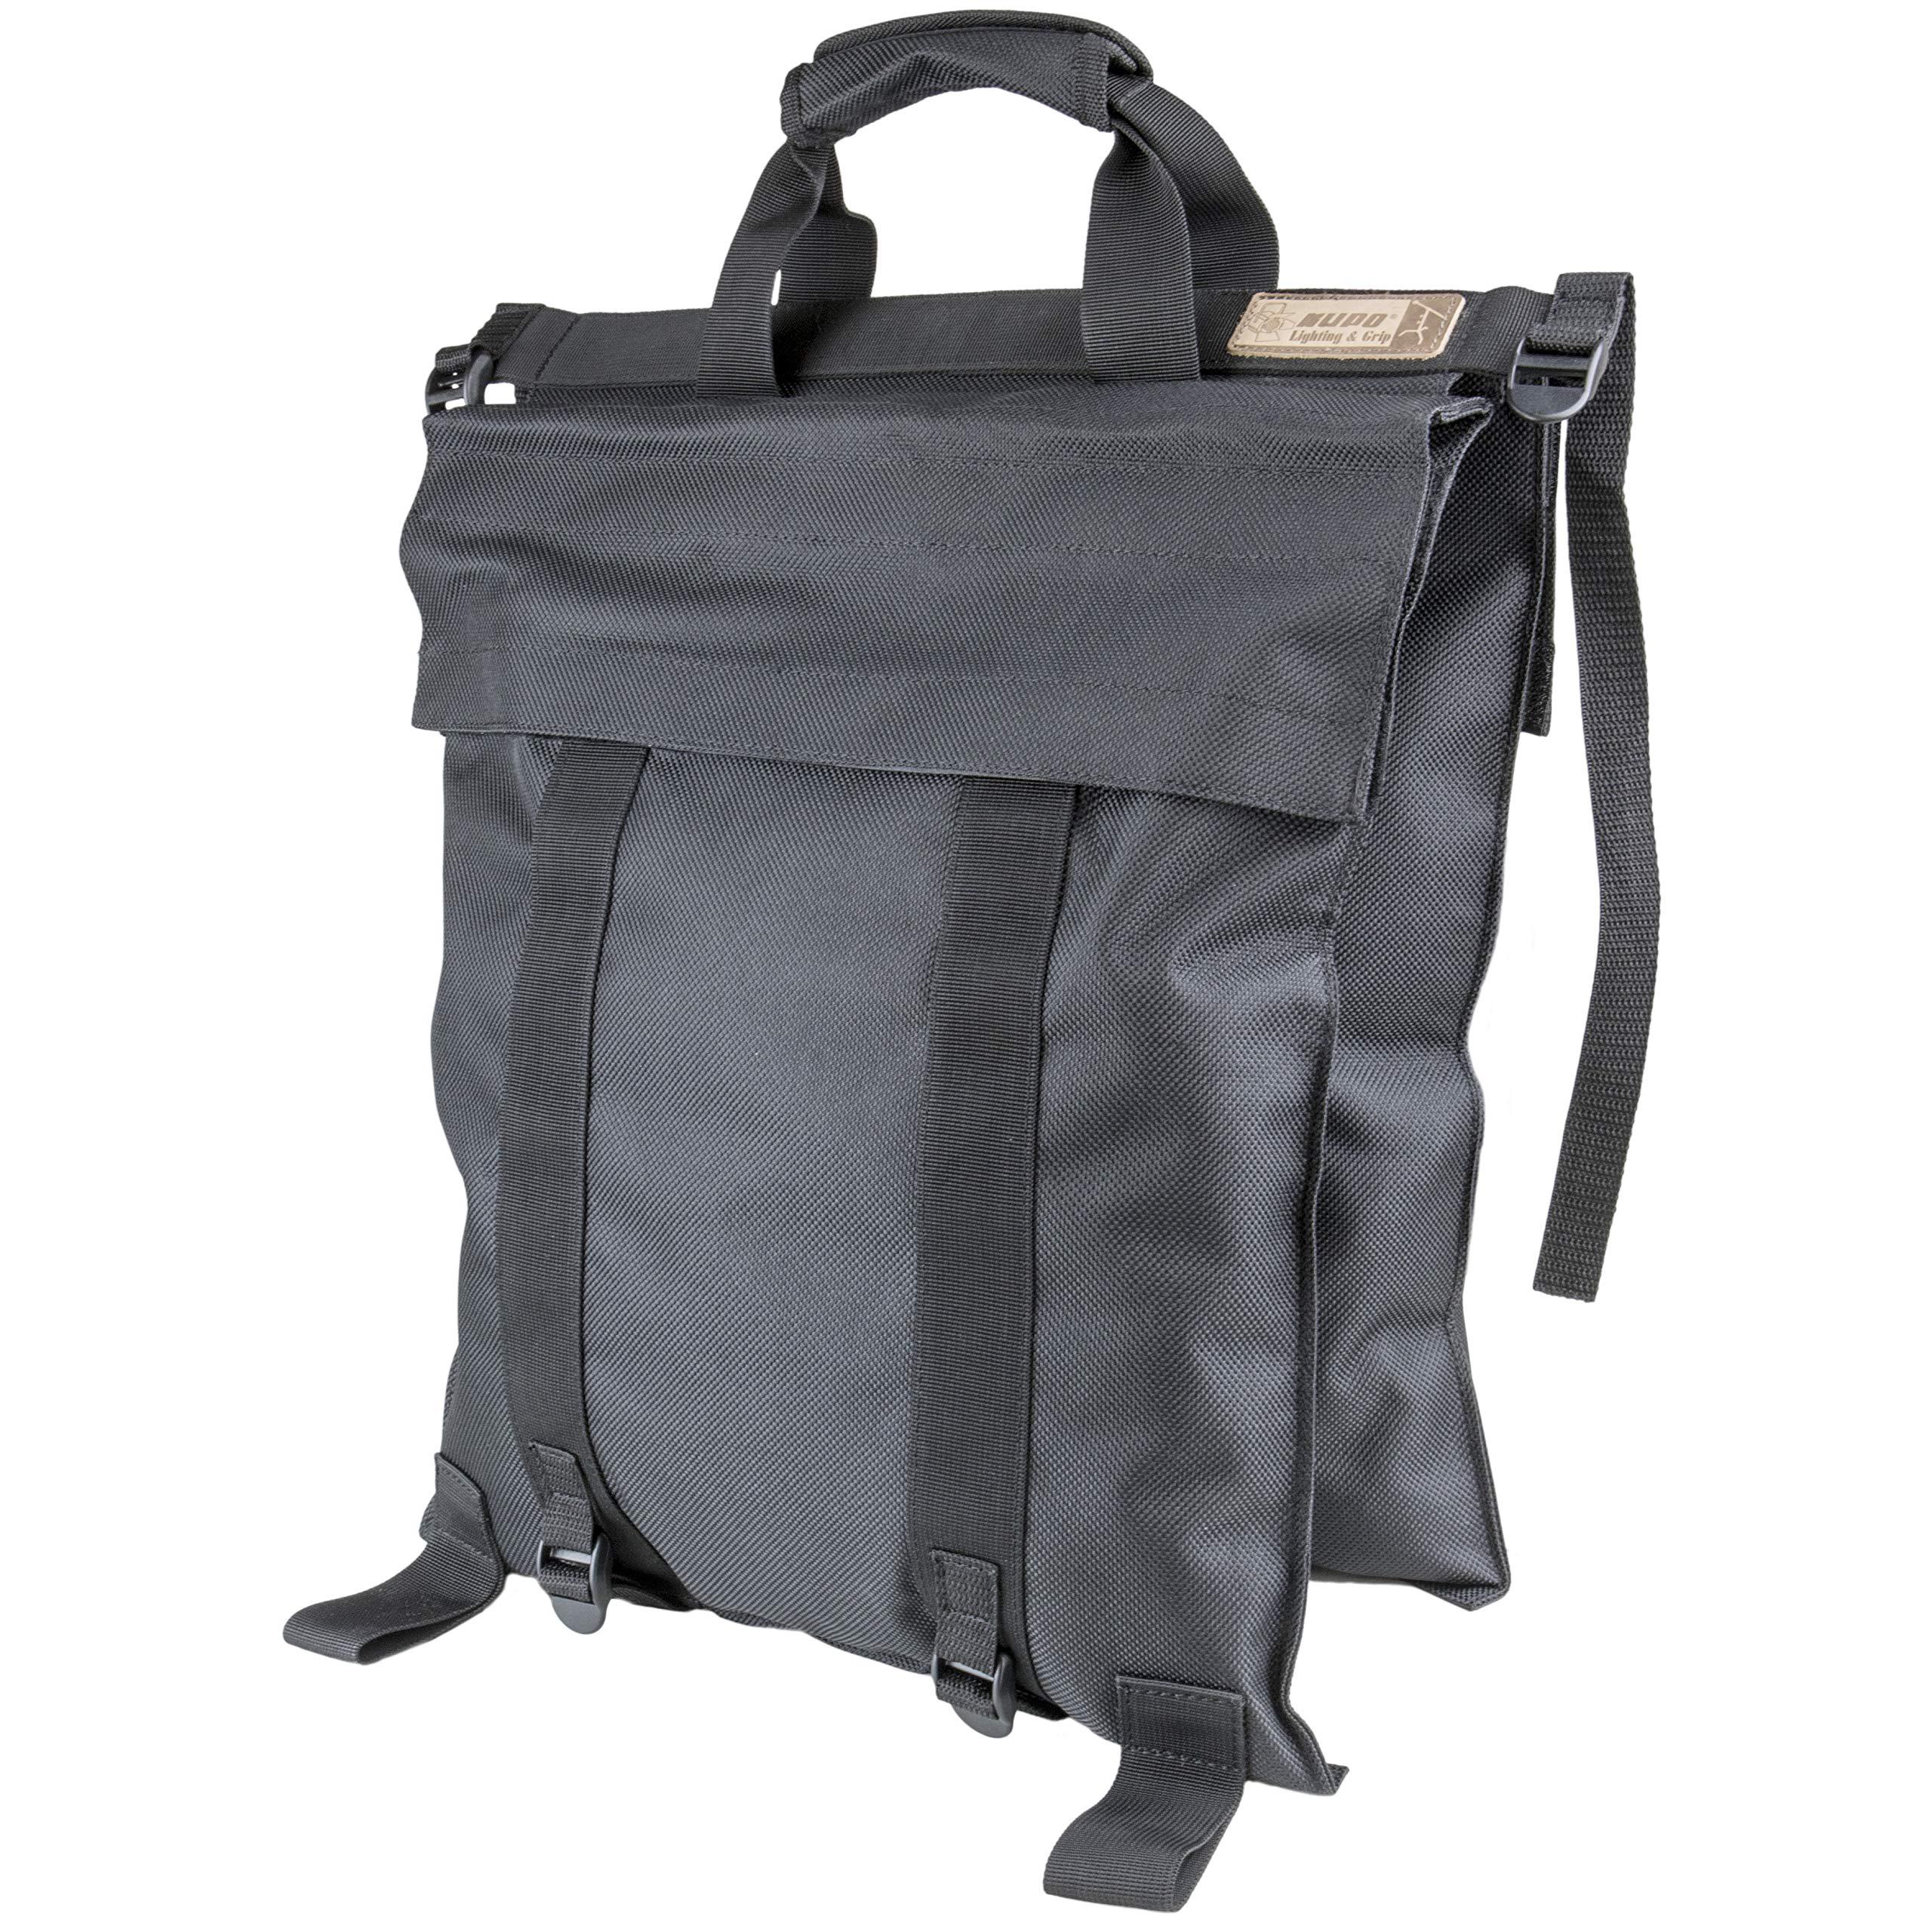 Kupo Sand Bag (Max. Load: 77lbs / 27.2kg) (KG091711) by Kupo